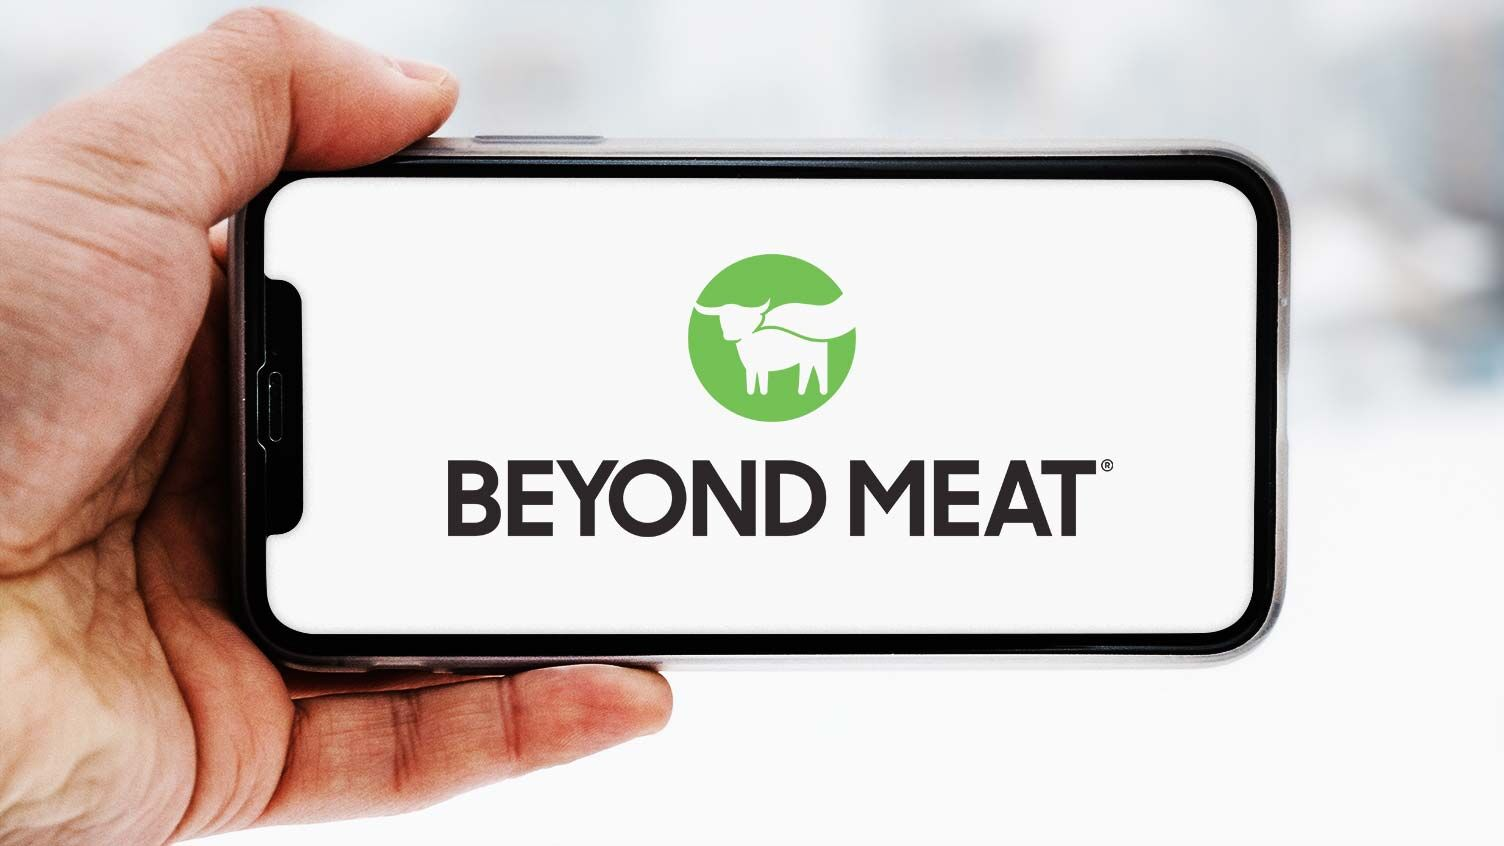 aktie-im-fokus-beyond-meat